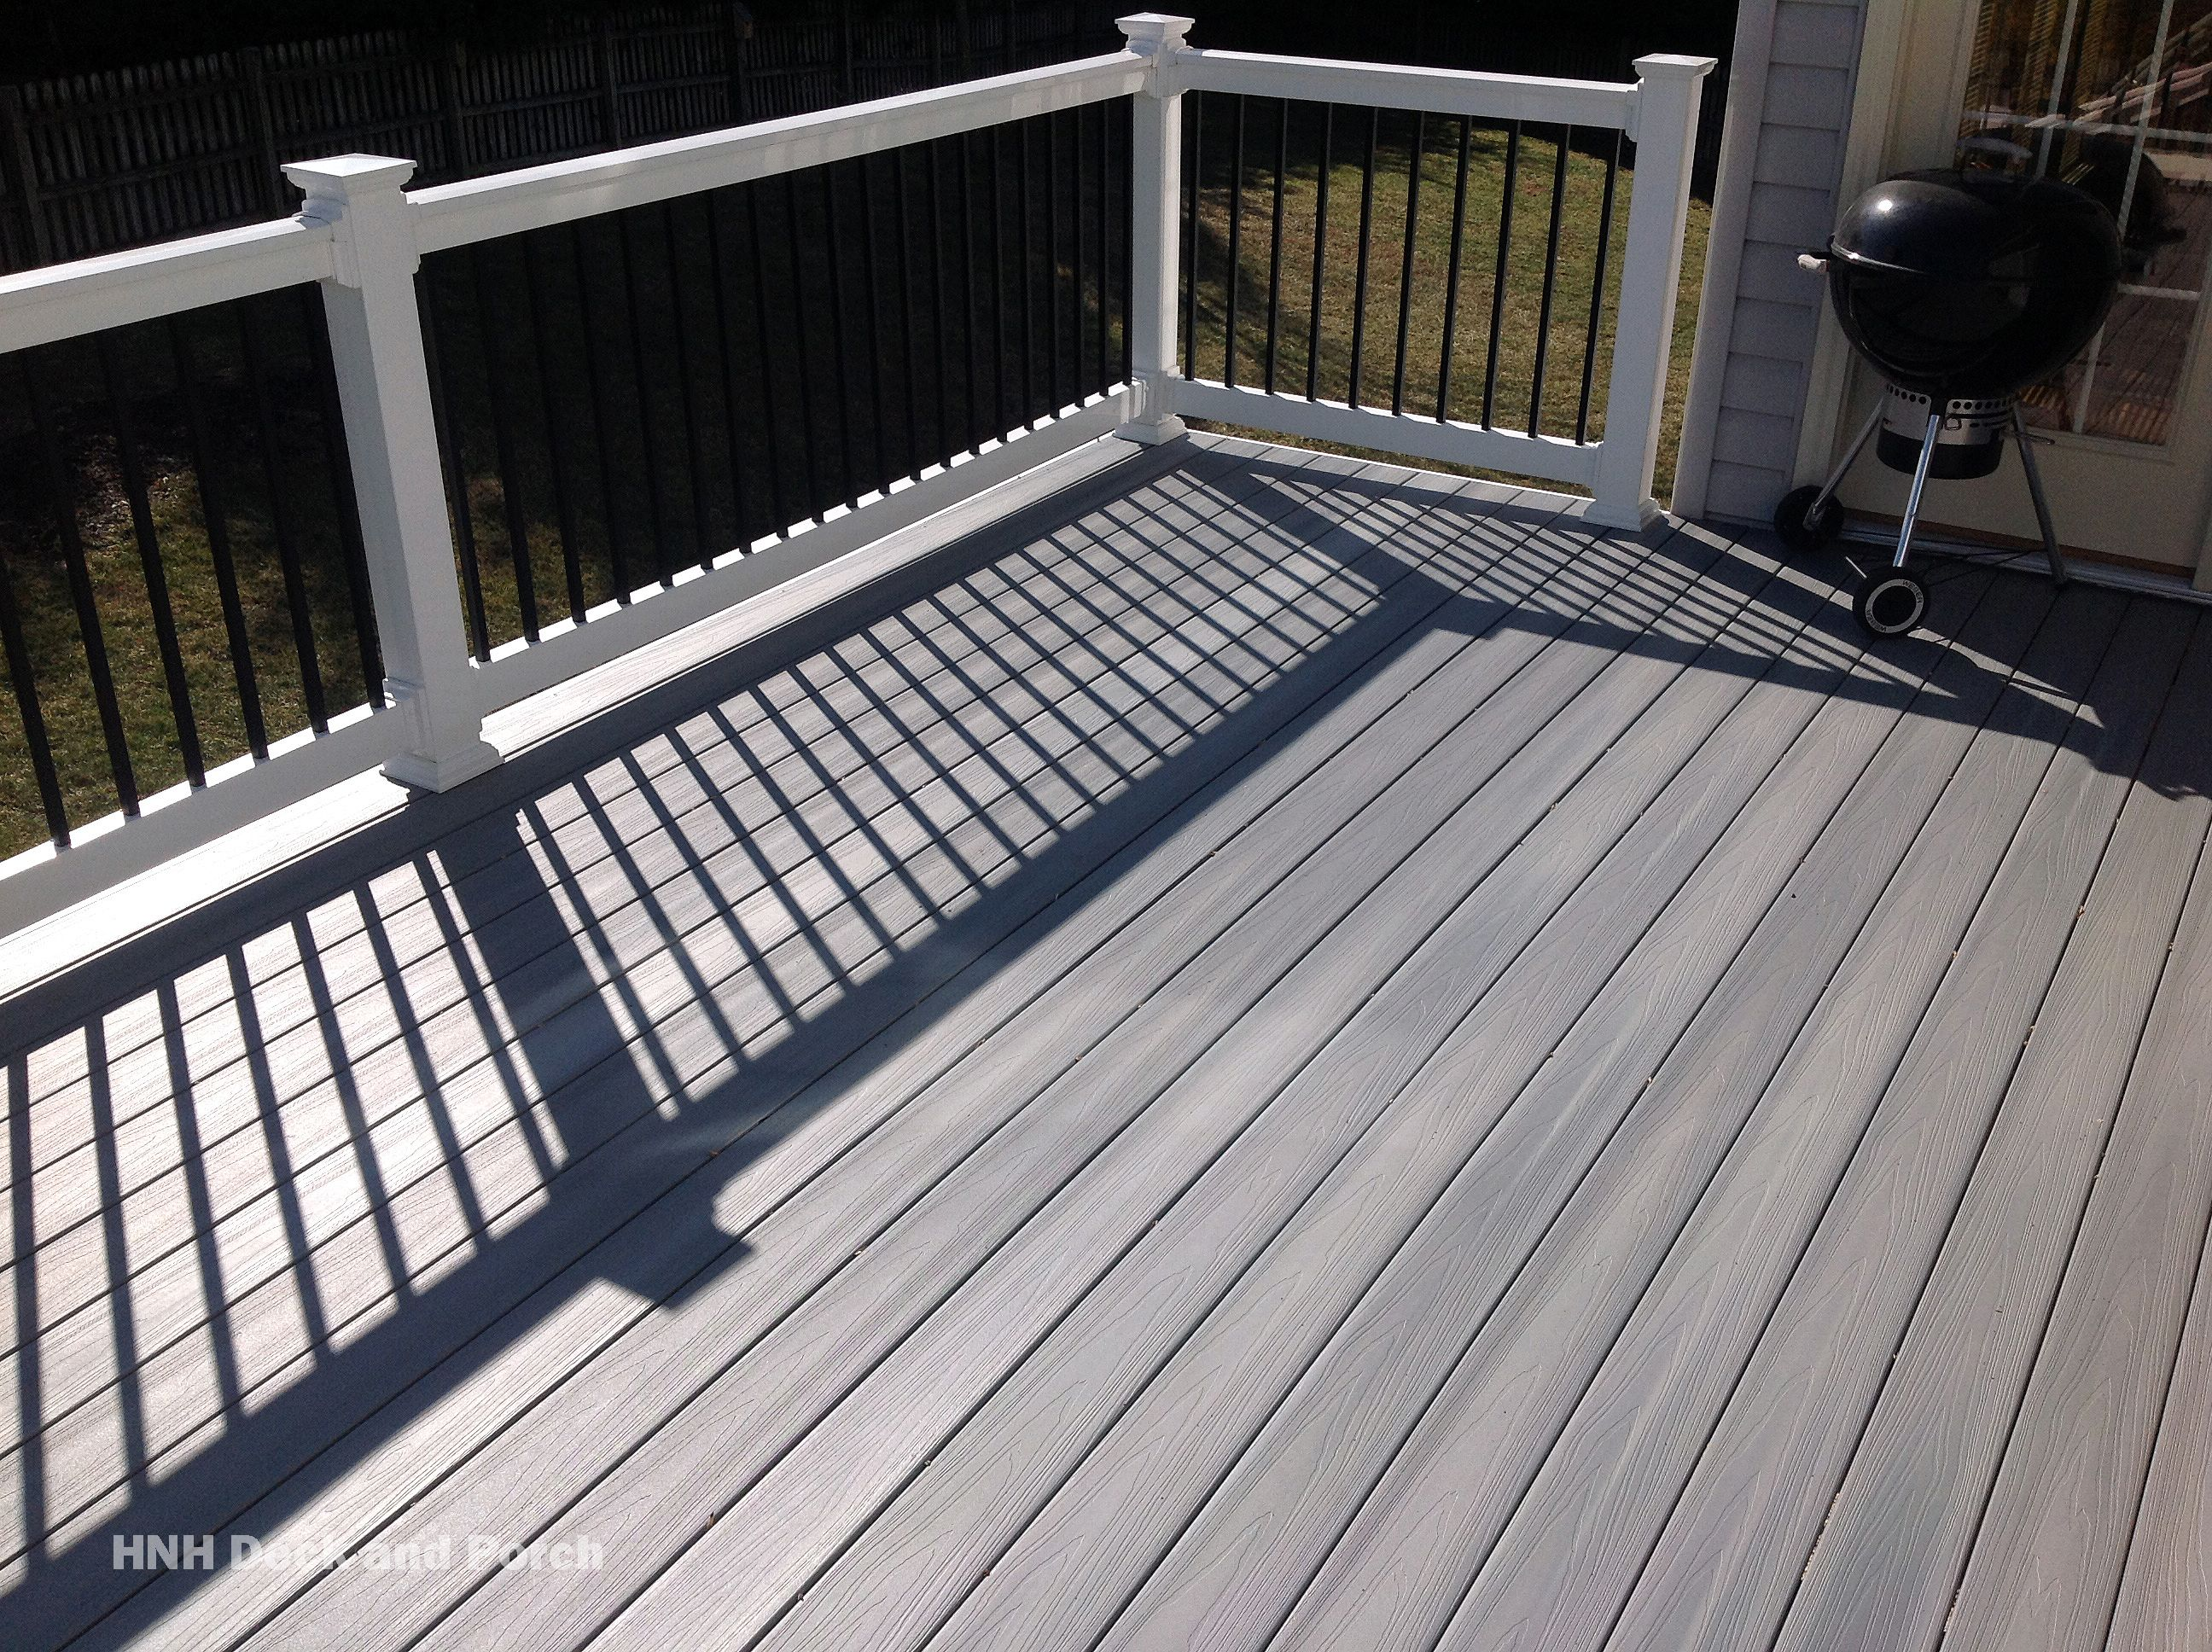 Composite Deck Using Fiberondecking Capstock Castle Grey Decking With White Pvc Railing And Black Square Aluminum Bal Deck Flooring Fiberon Composite Decking